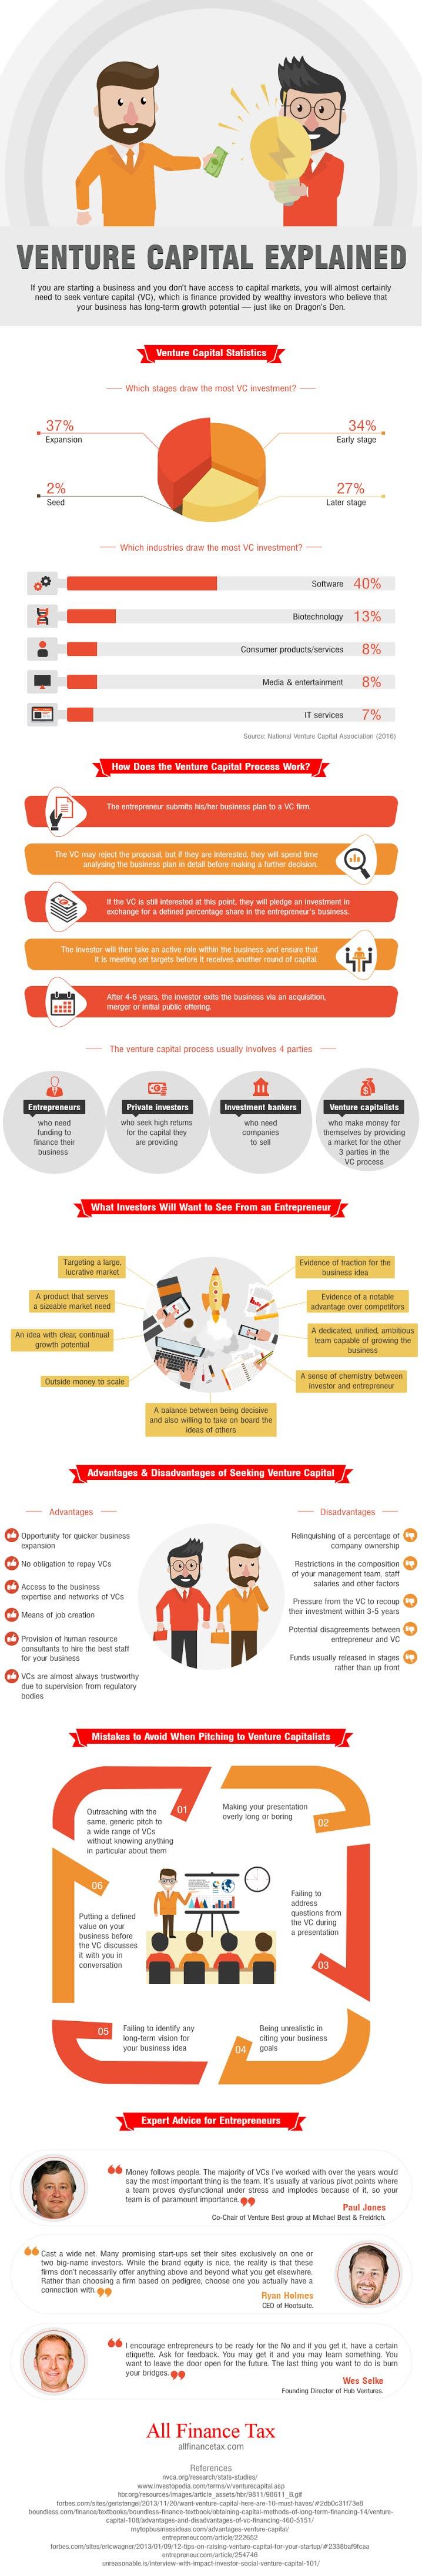 Venture Capital Explained #infographic